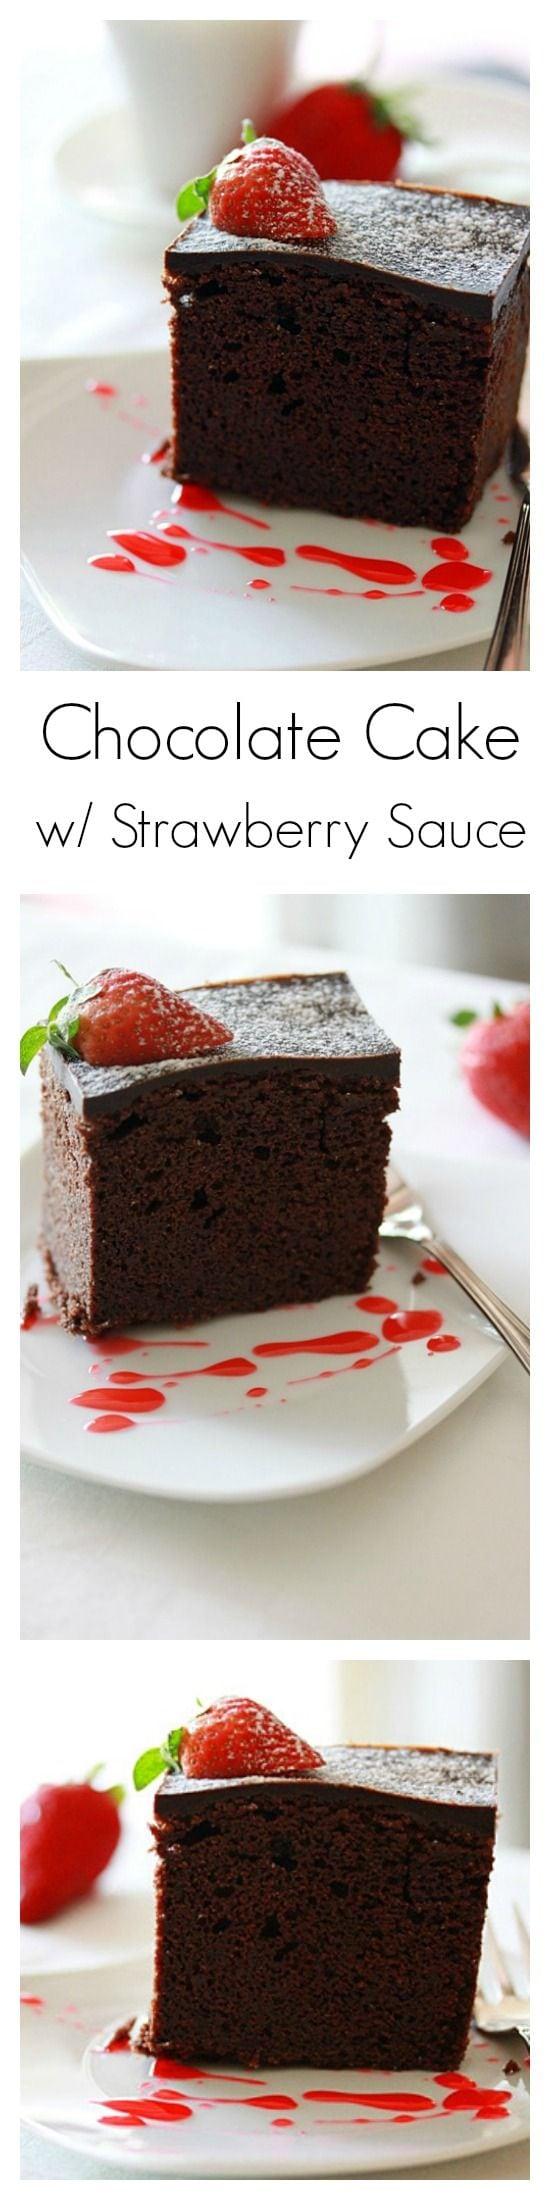 Chocolate cake and chocolate cake recipe. Easy chocolate cake recipe that calls for rich chocolate, butter, flour, and sugar to make chocolate cake. | rasamalaysia.com